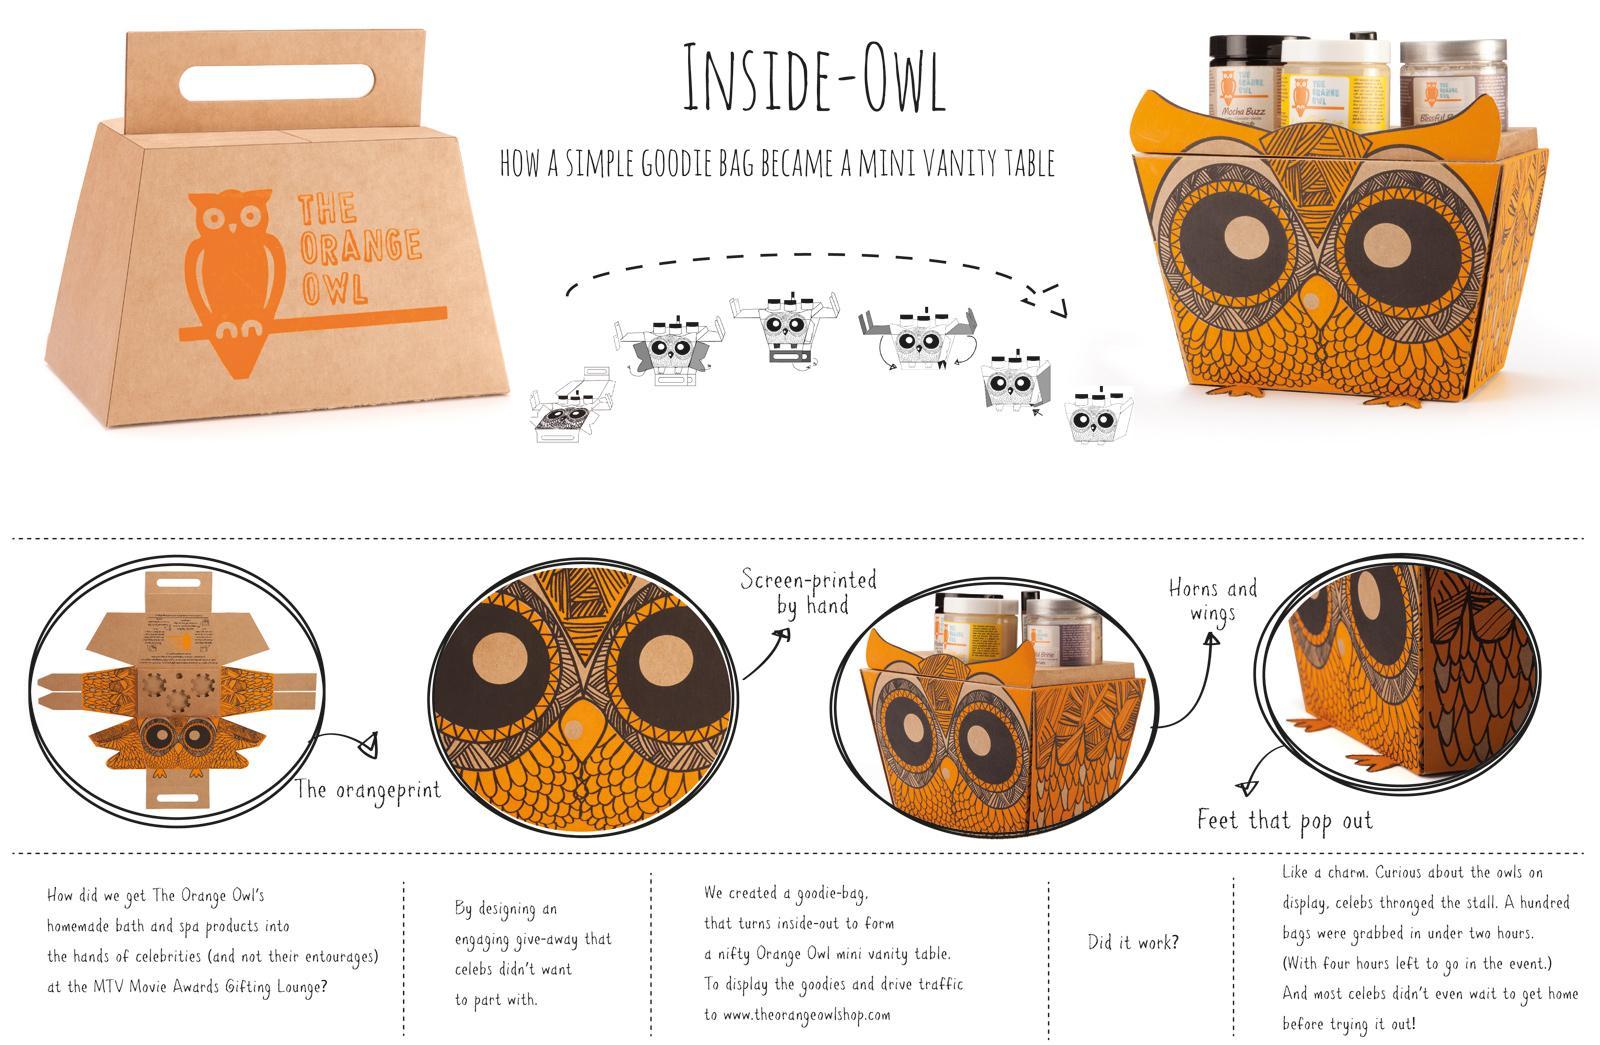 The Orange Owl Direct Ad -  Inside-owl